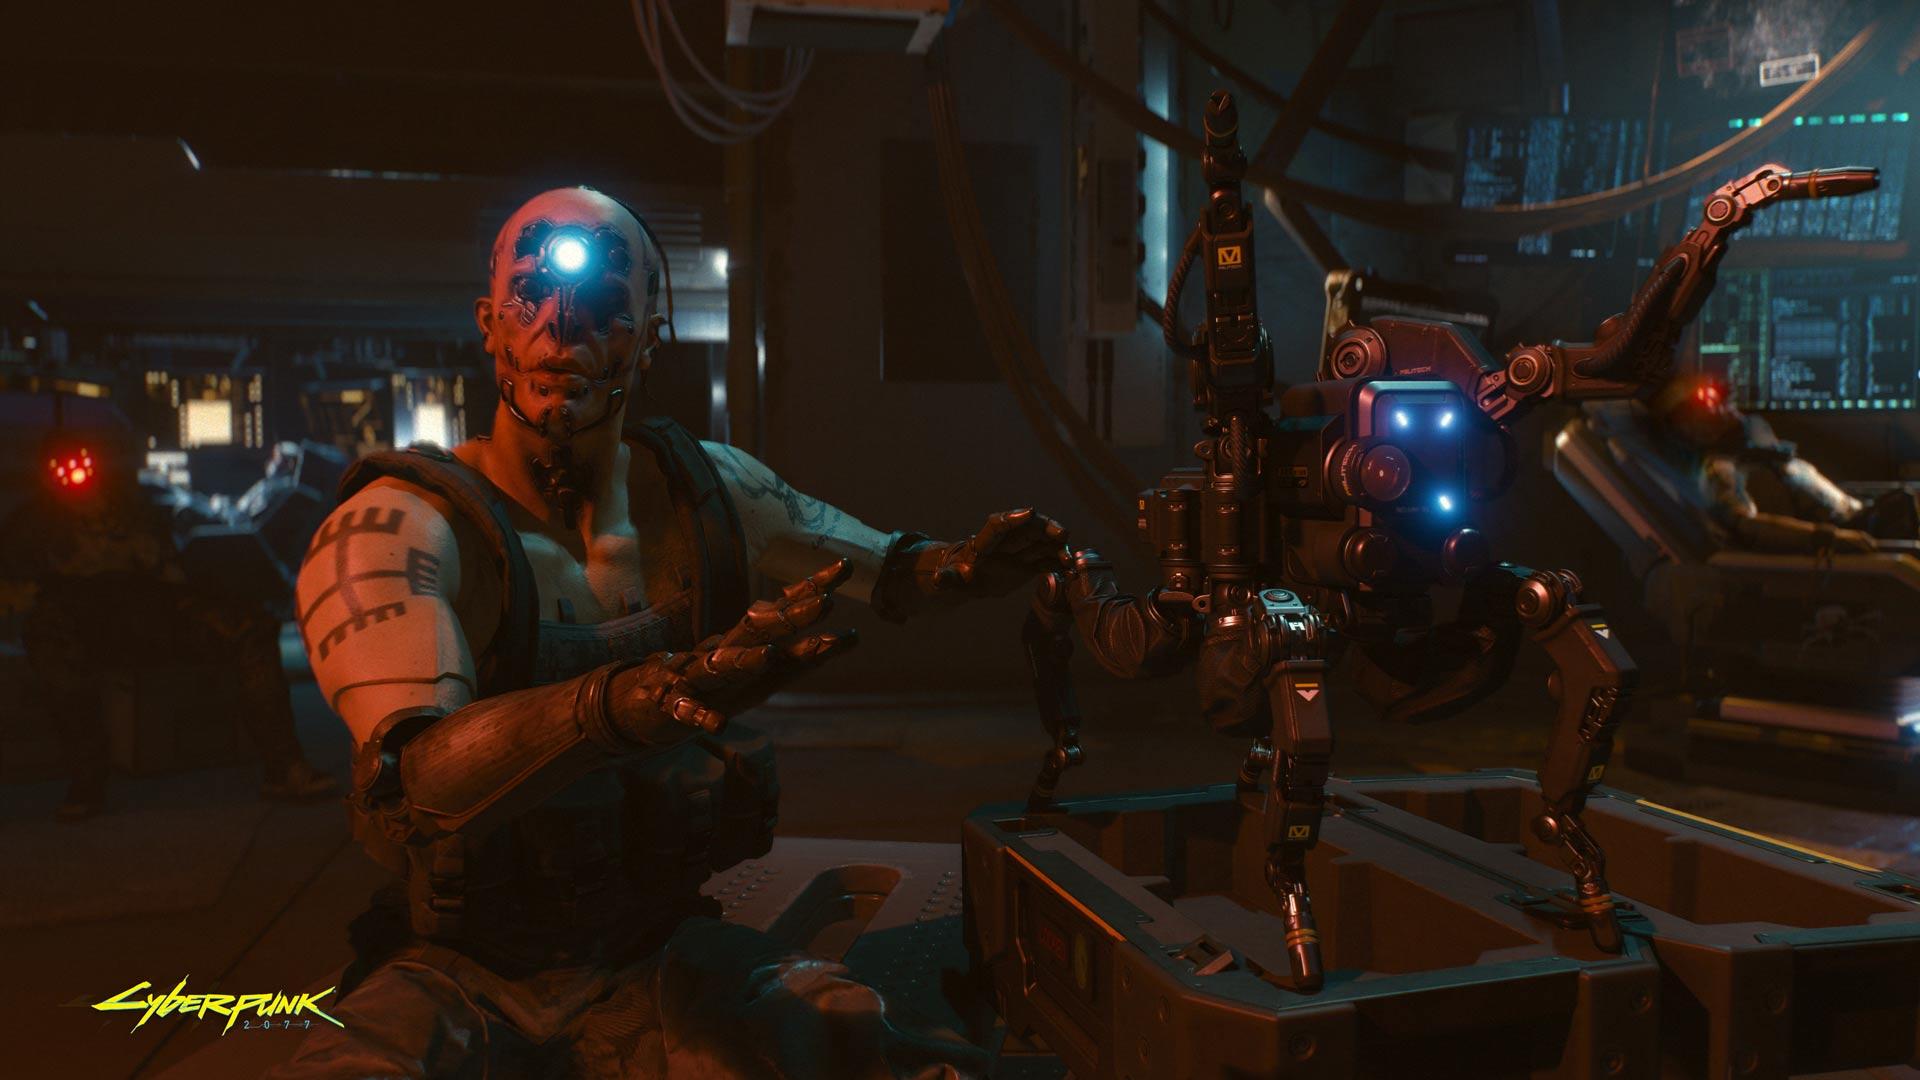 Buying Cyberpunk 2077 from GOG will get you some bonus lore screenshot